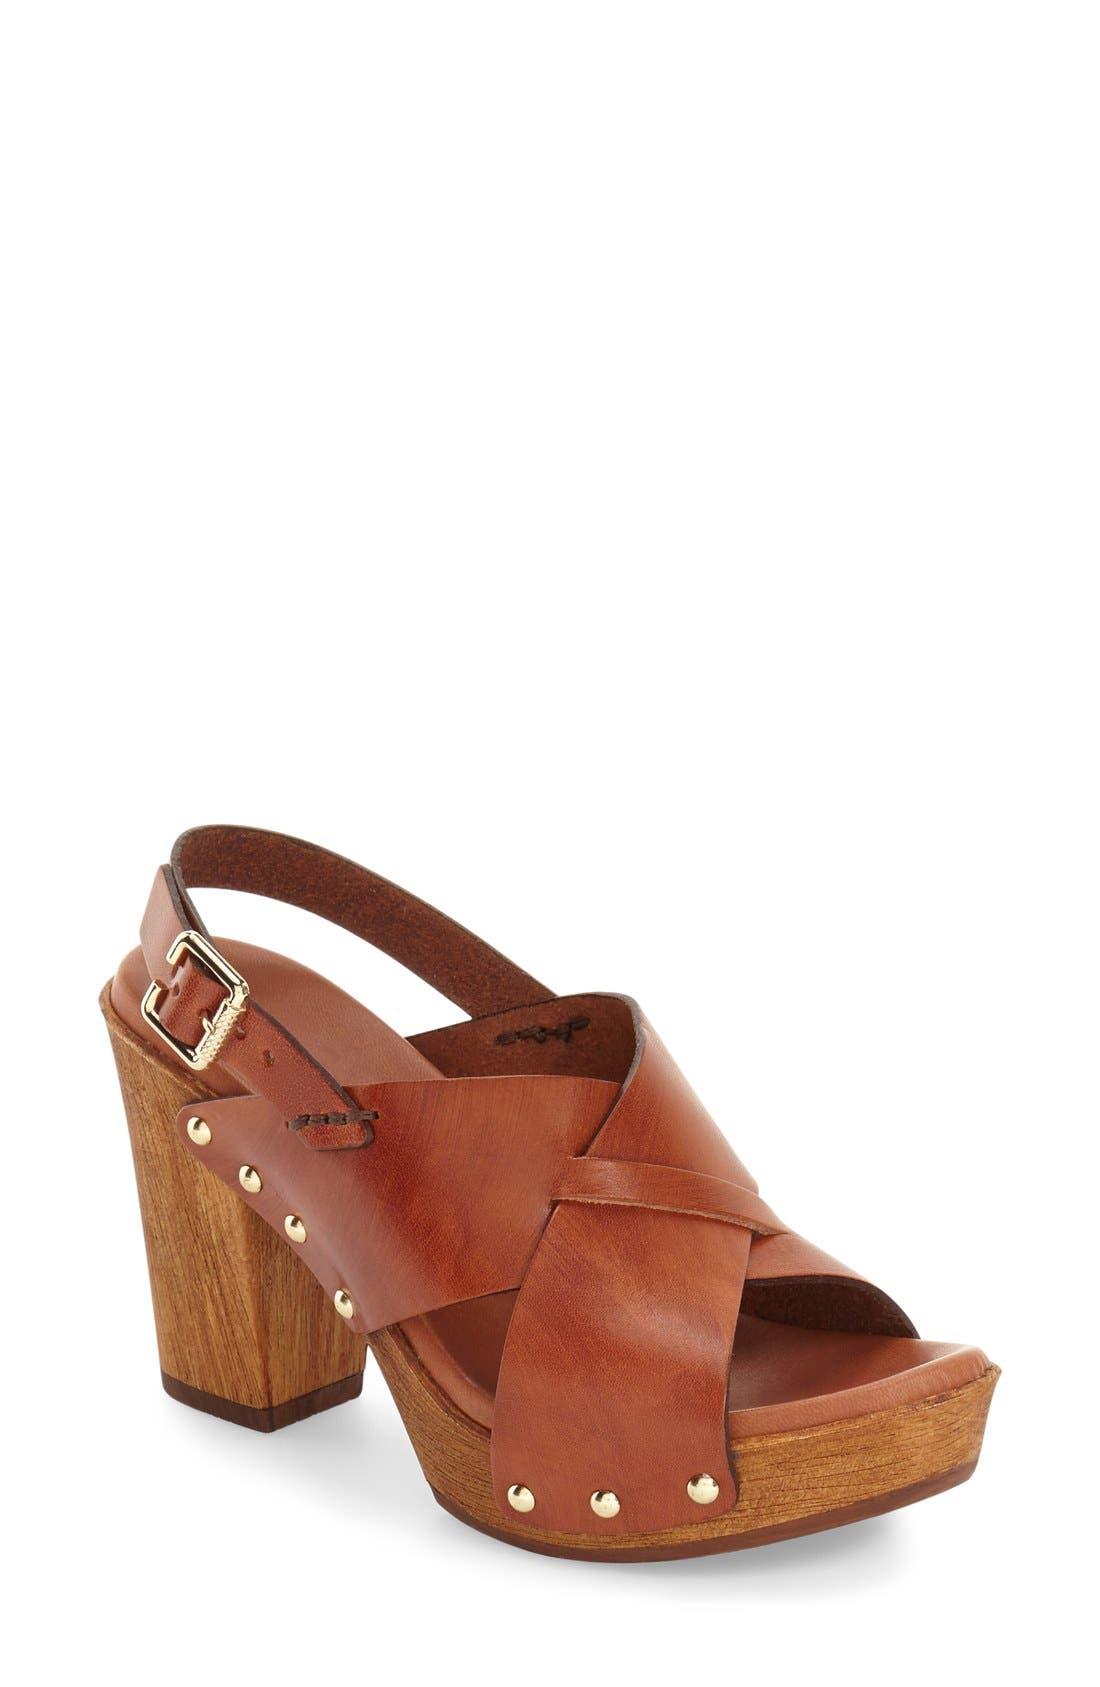 Alternate Image 1 Selected - Kenneth Cole New York 'Belle' Platform Sandal (Women)